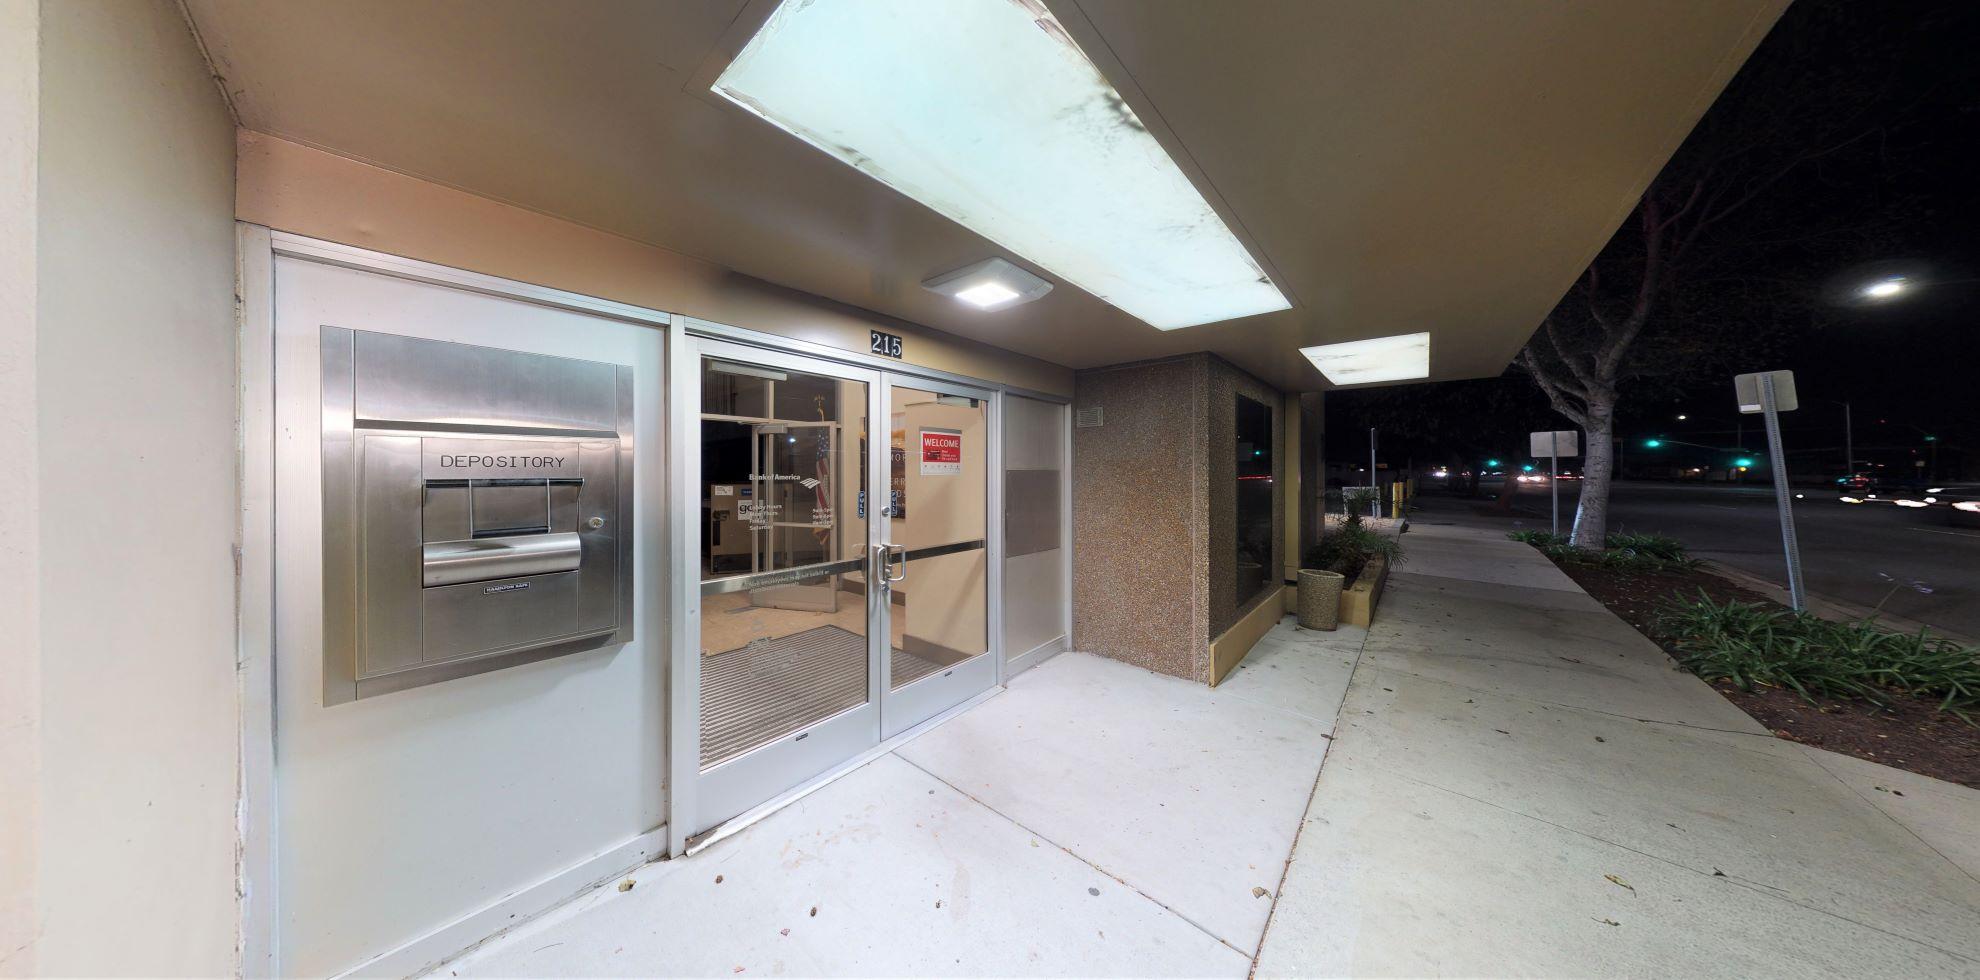 Bank of America walk-up ATM | 215 North H St, Lompoc, CA 93436